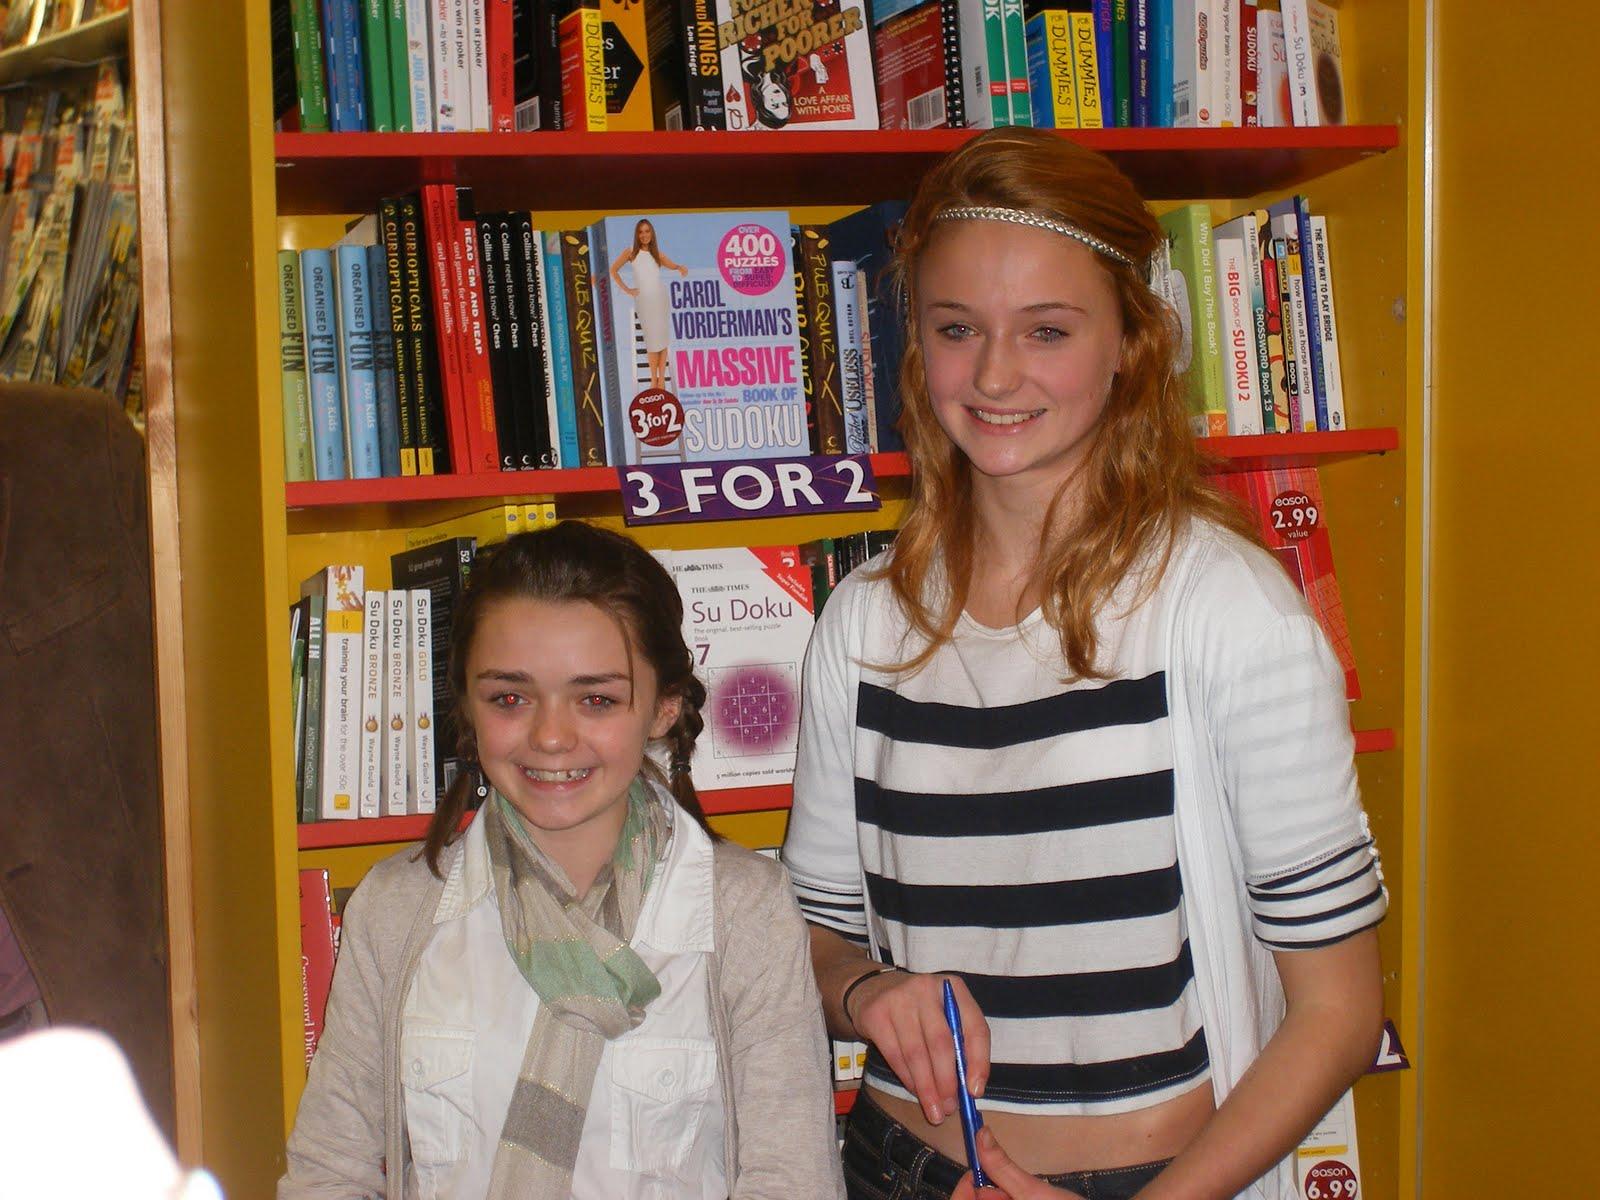 Maisie Williams (Arya Stark) and Sophie Turner (Sansa Stark) — you cannot. Source: Blogspot user thewertzone